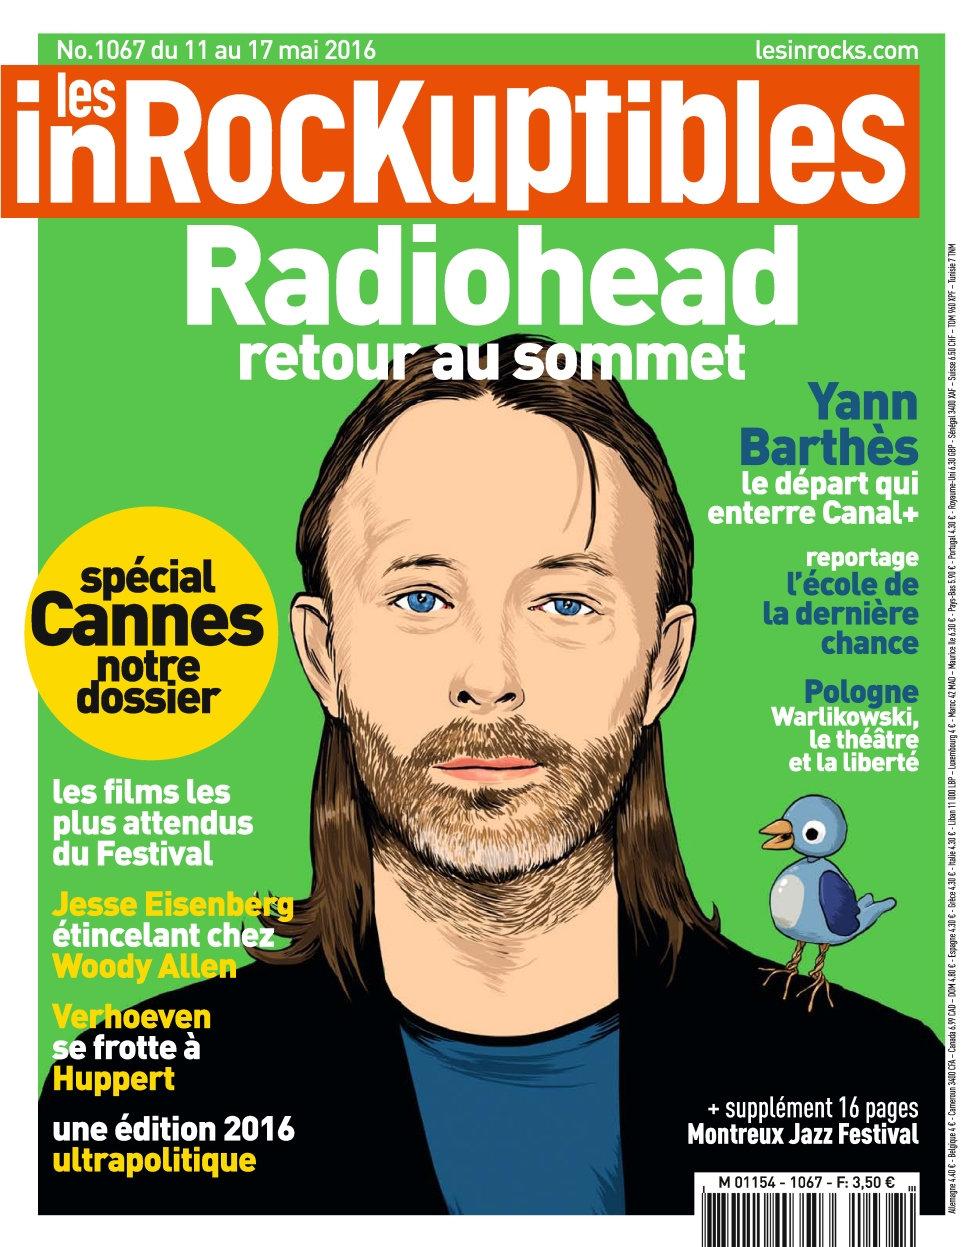 Les Inrockuptibles N°1067 - 11 au 17 Mai 2016